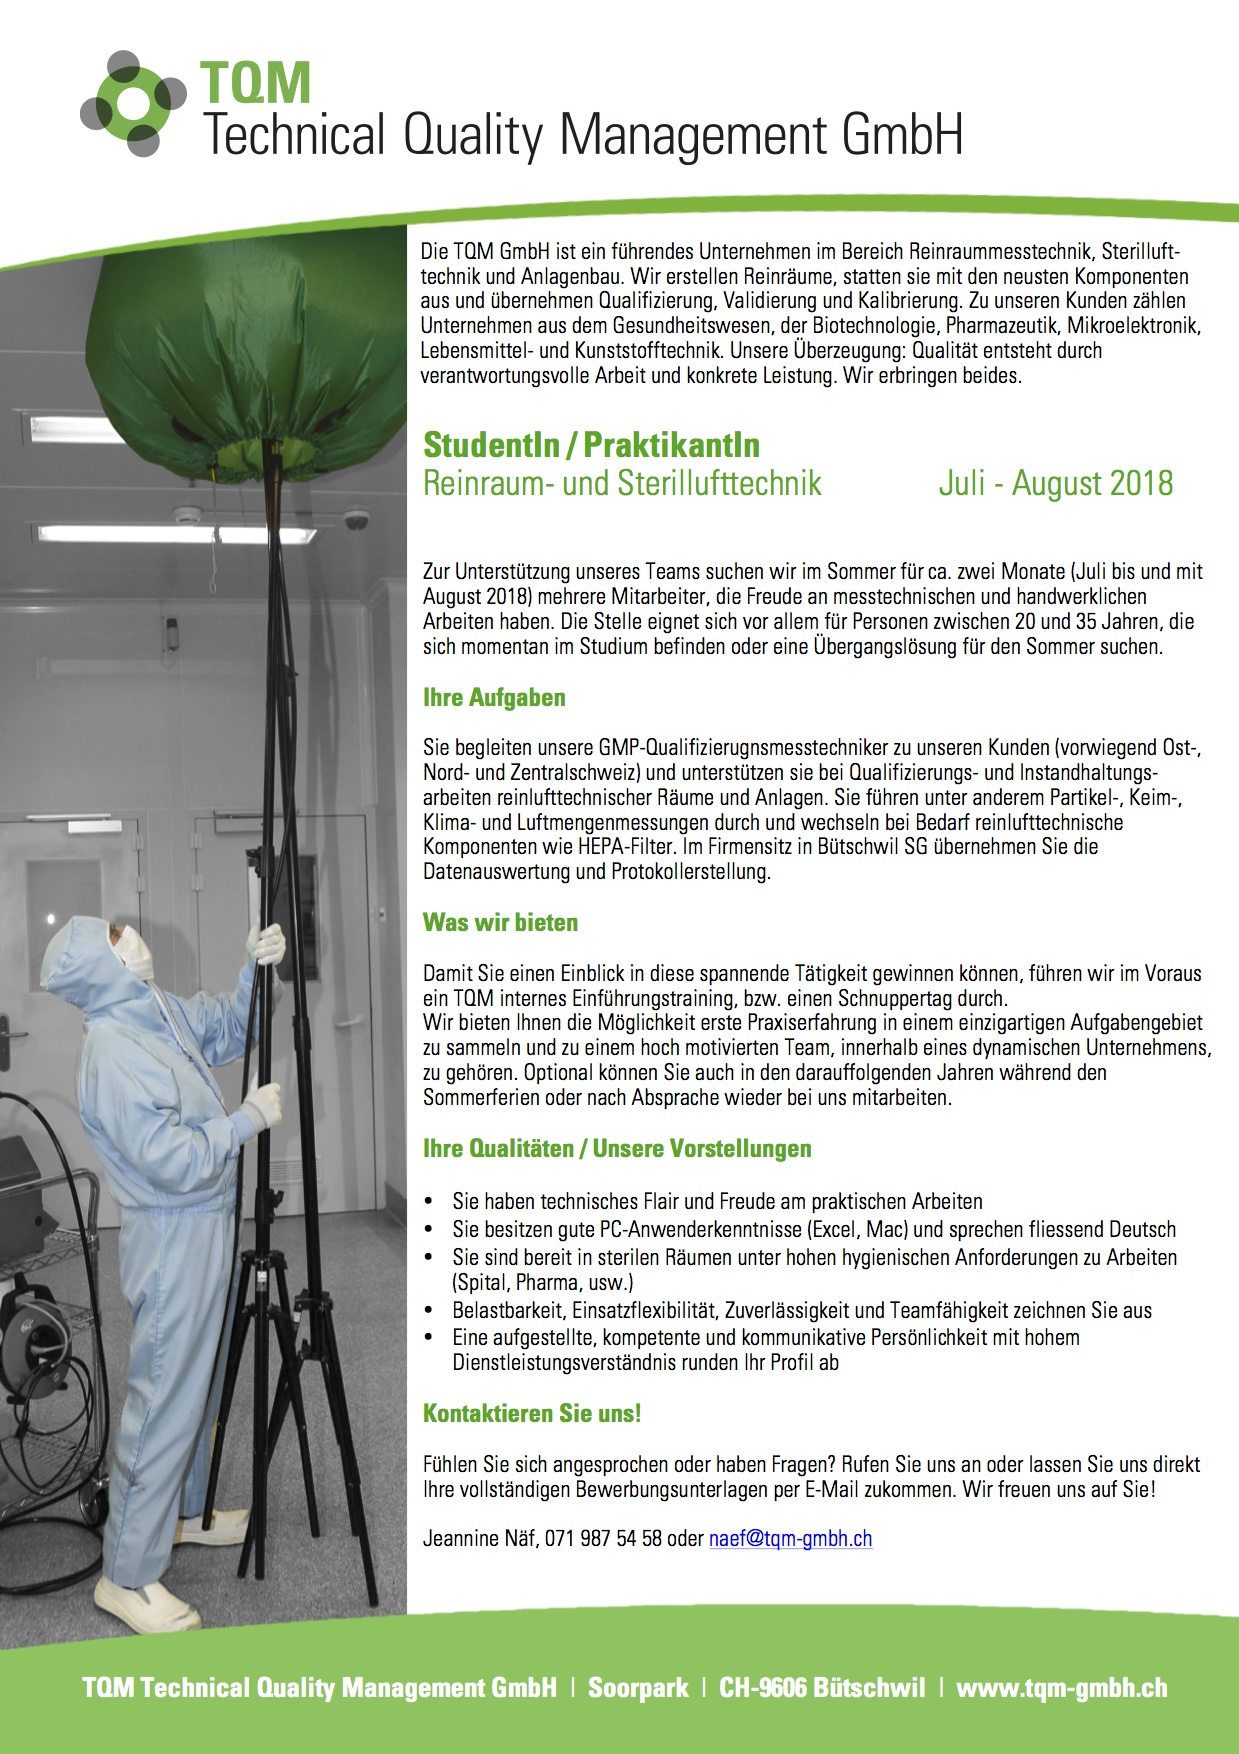 Offene Stellen TQM GmbH Studentenjob Praktikum